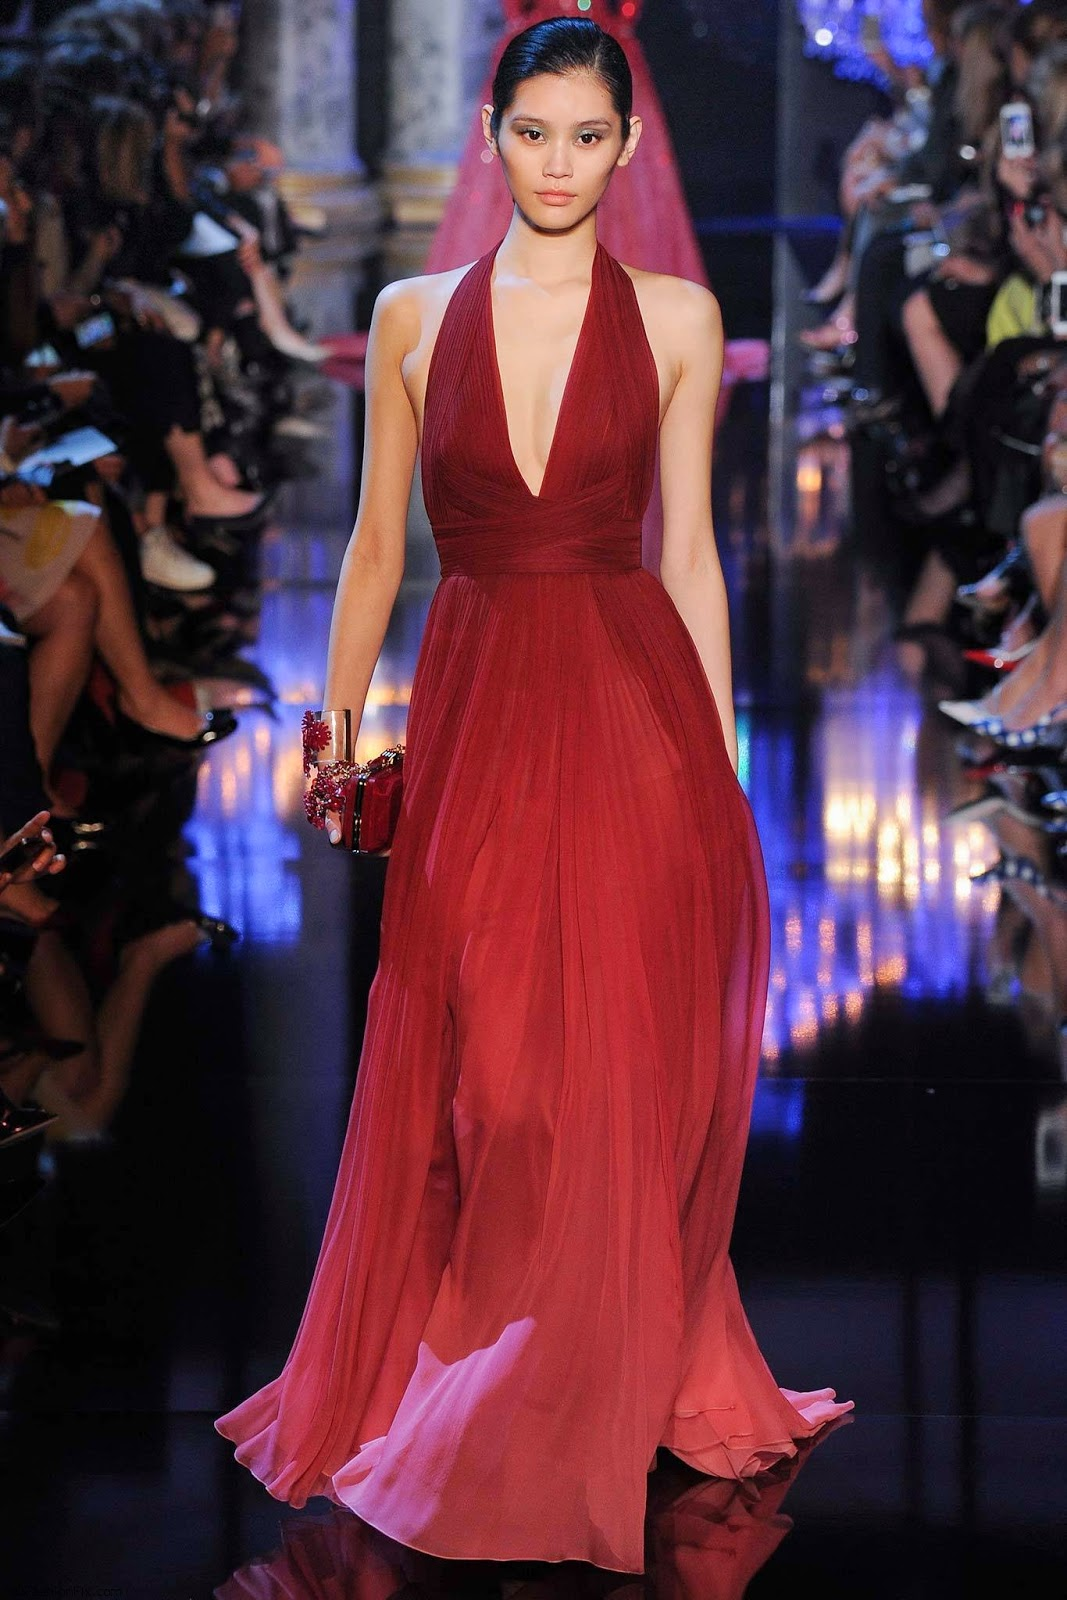 Robe de mariee rouge haute couture